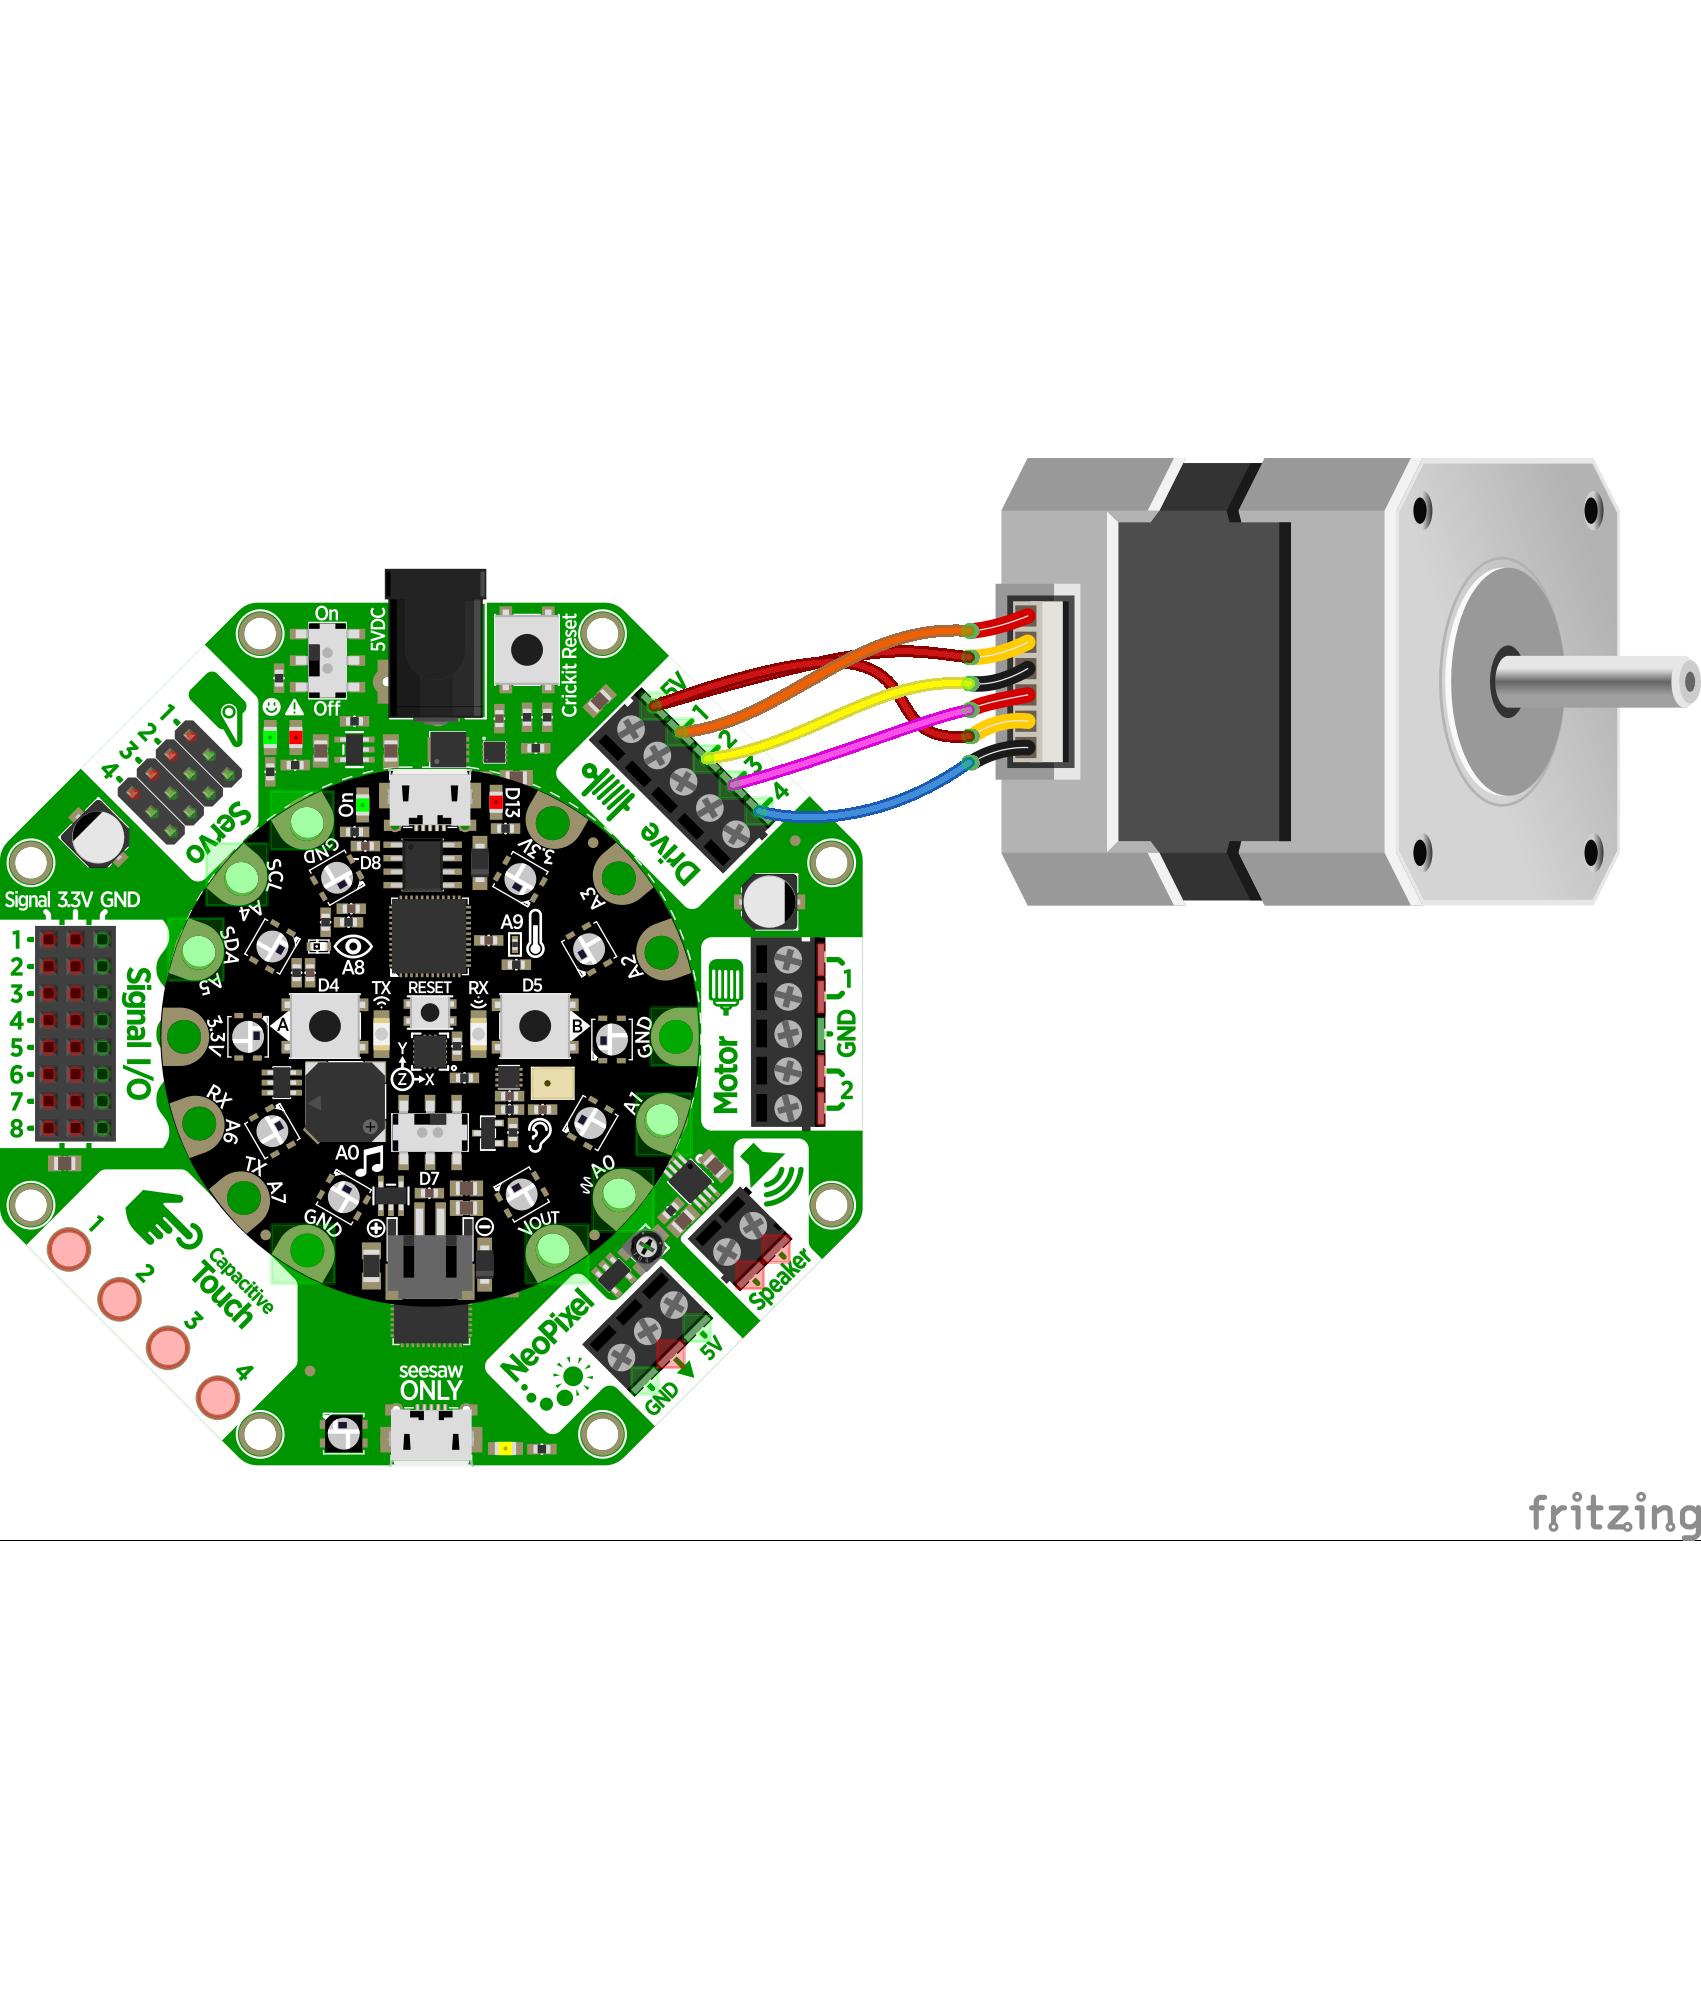 robotics___cnc_circuit_playground_unipolardrive_bb.png